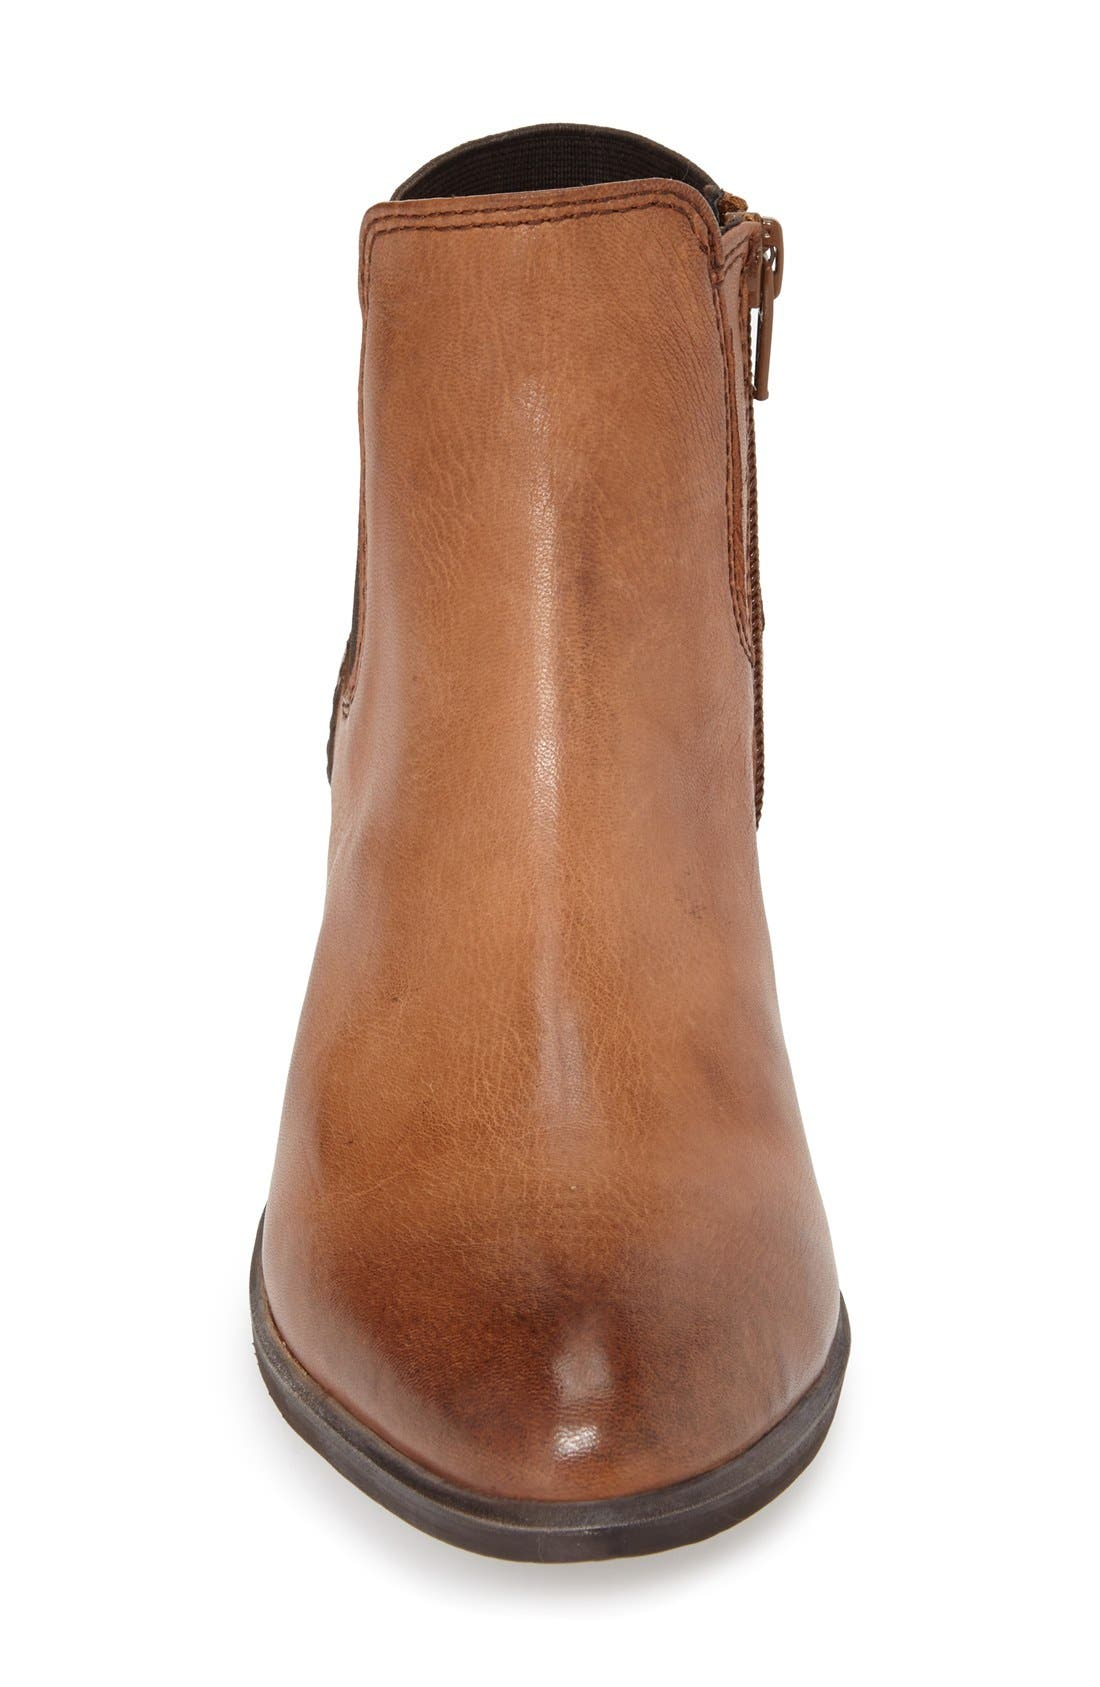 Alternate Image 3  - Steve Madden 'Rozamare' Leather Ankle Bootie (Women)